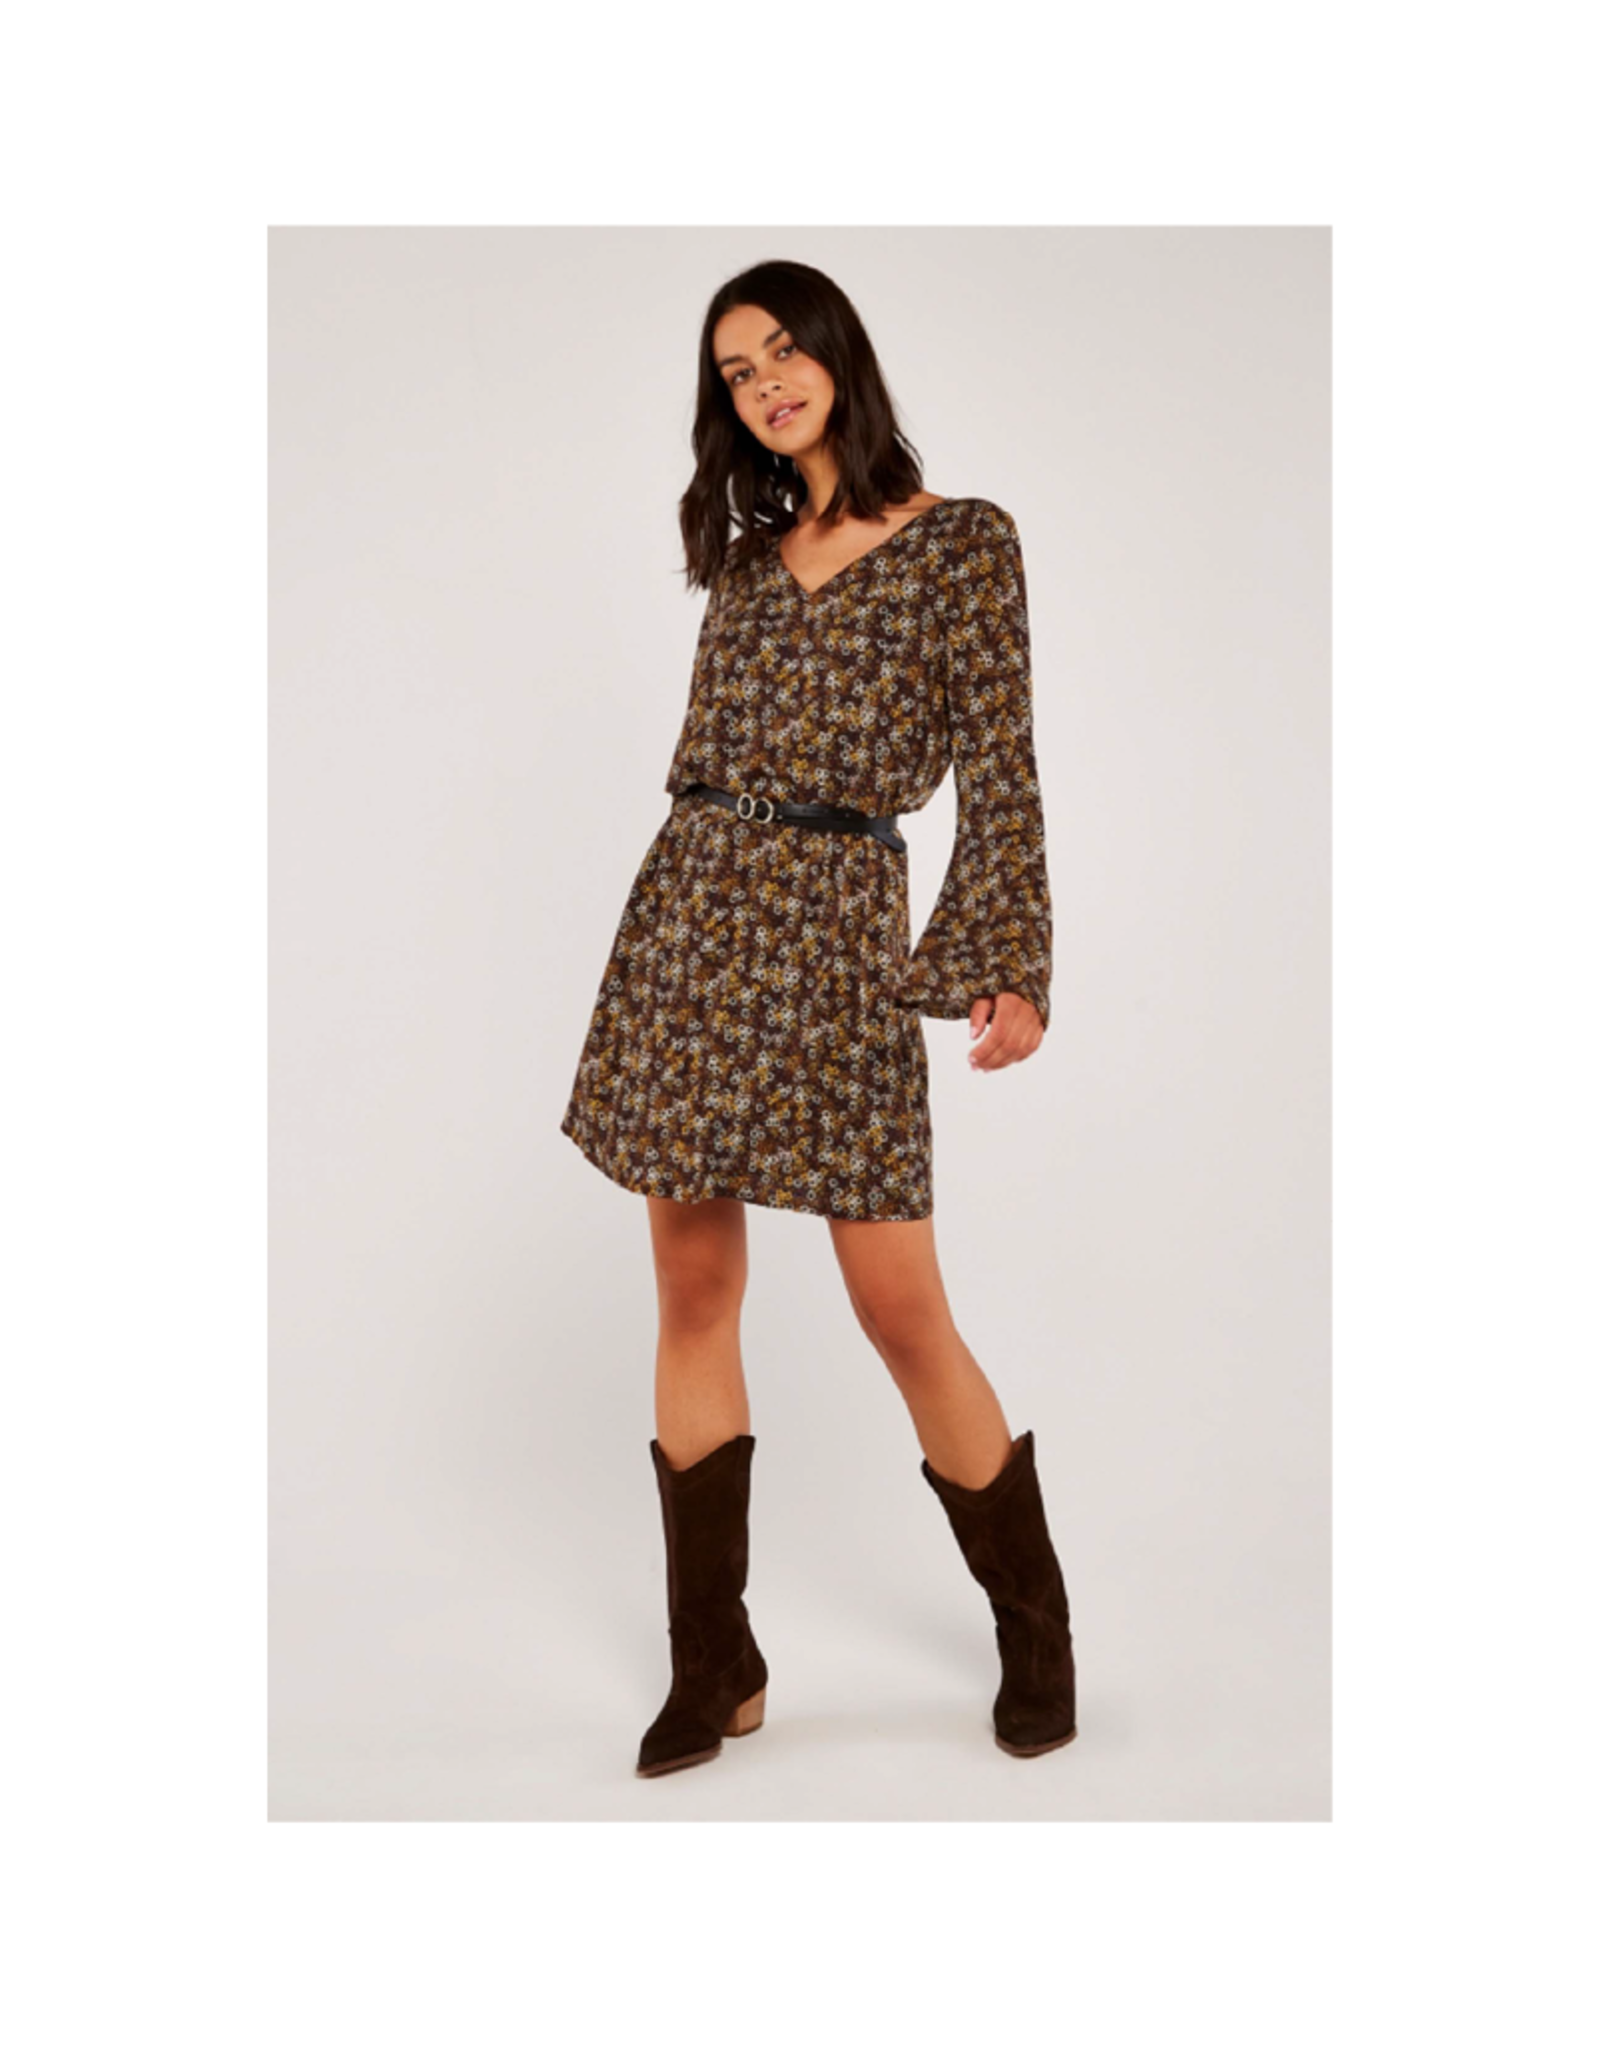 Apricot V-Neck Bell Sleeve Ditzy Print Dress